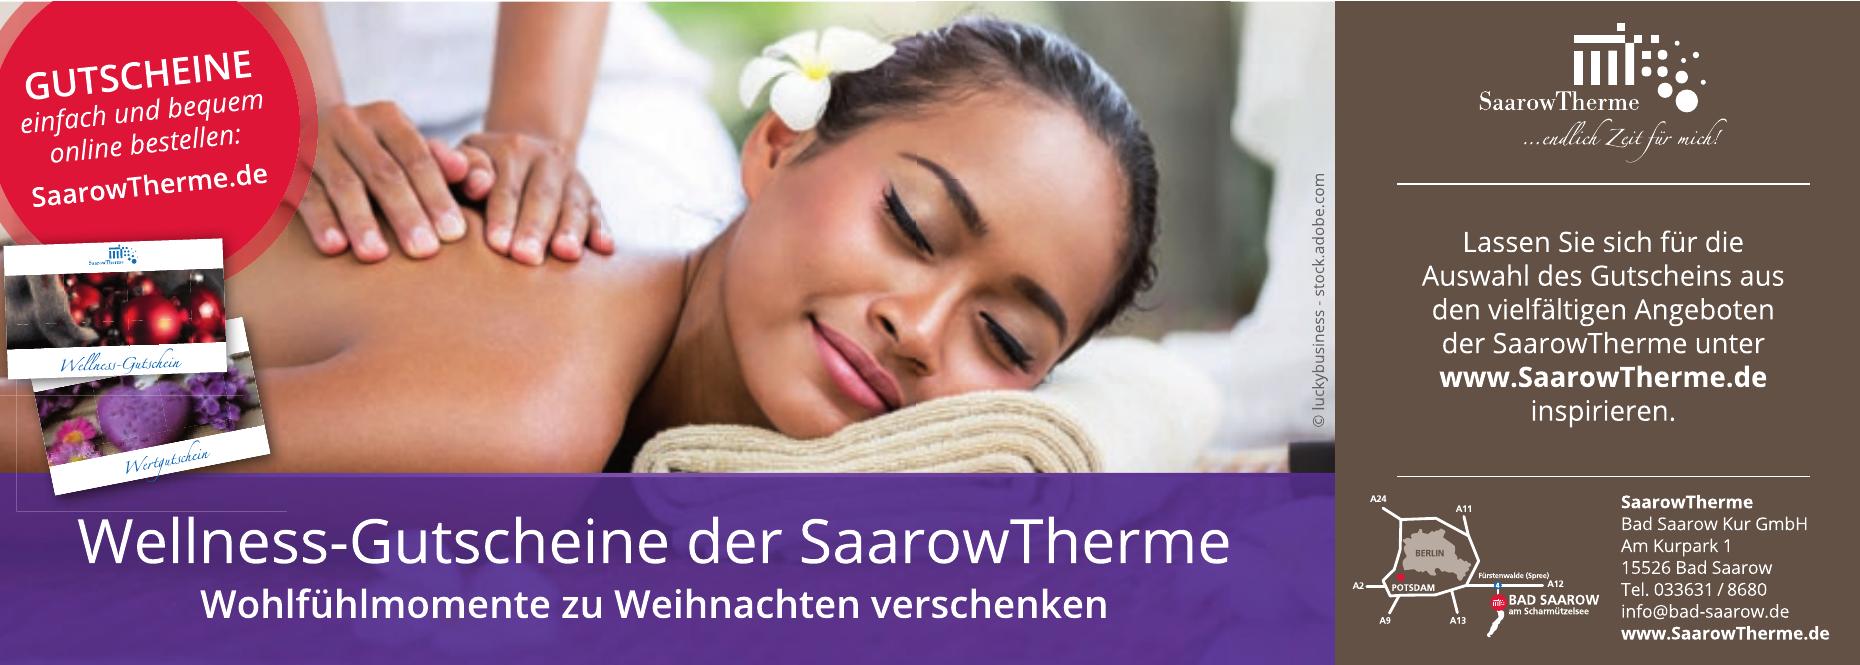 Saarow Therme Bad Saarow Kur GmbH